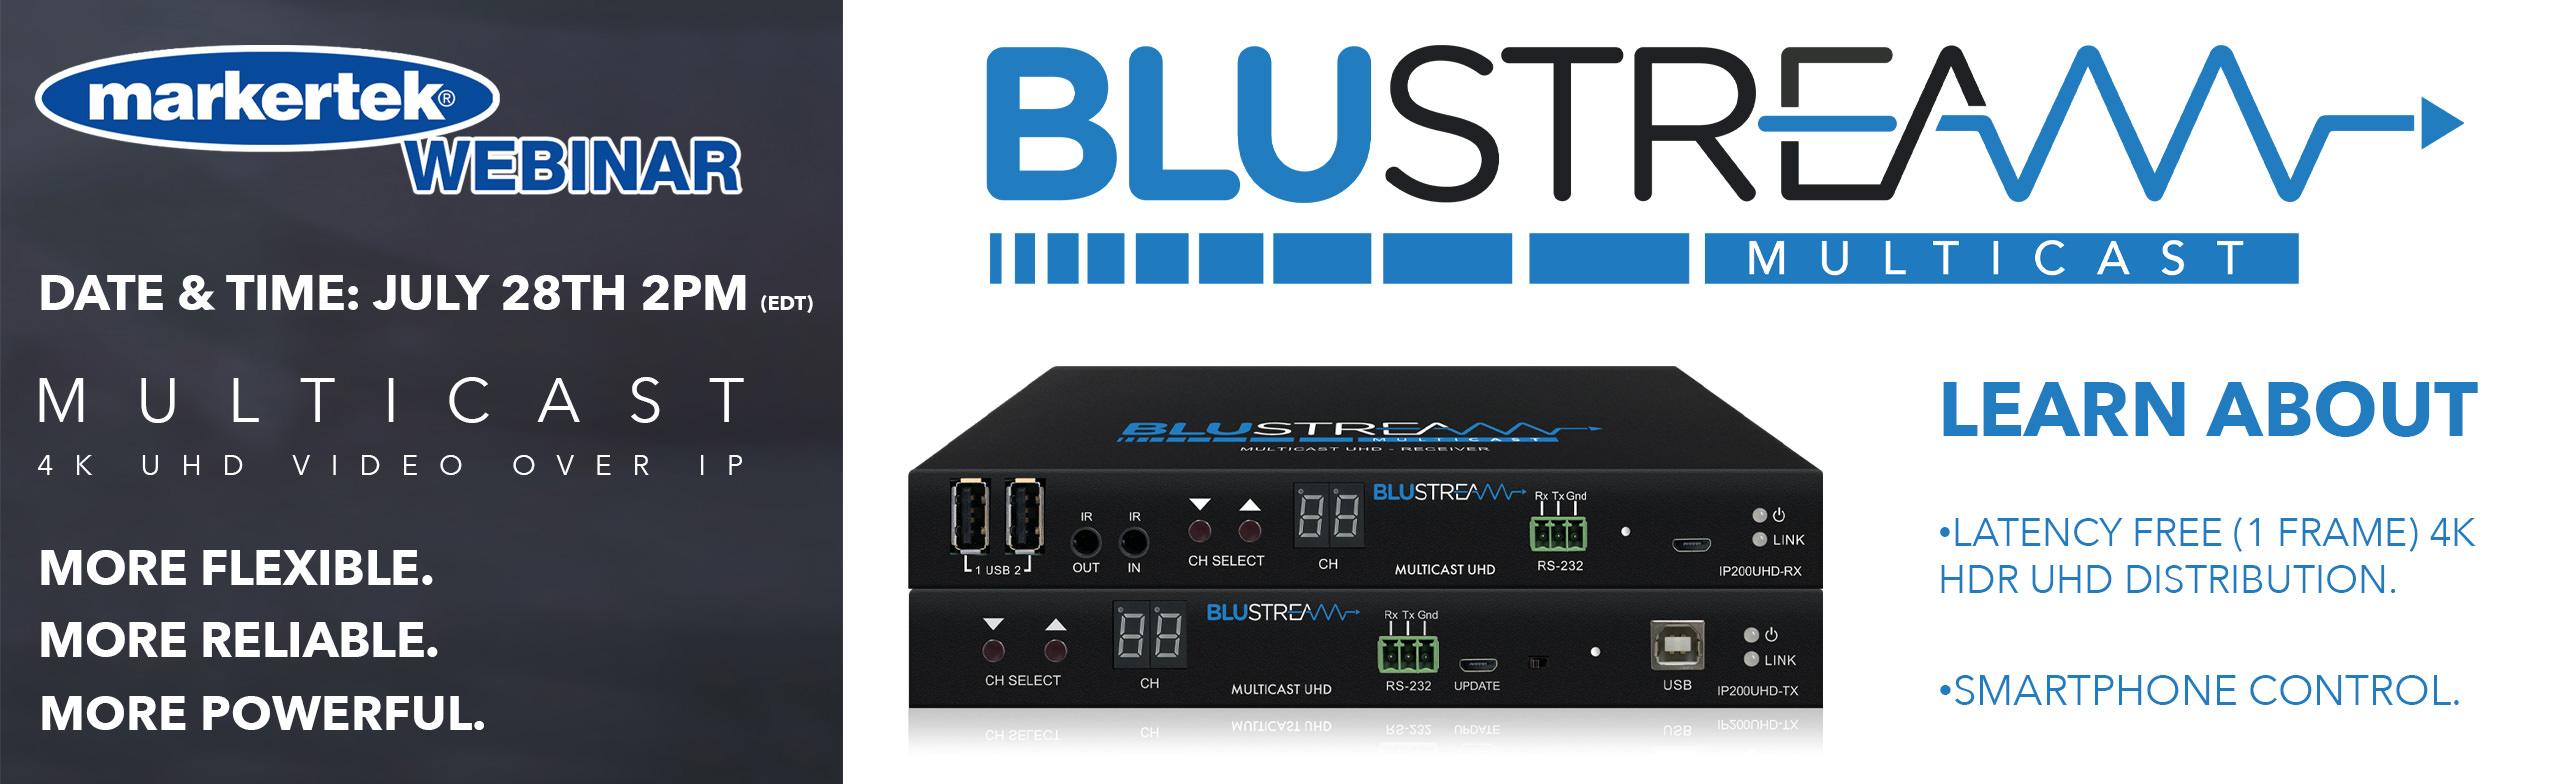 blustream video over ip webinar with markertek